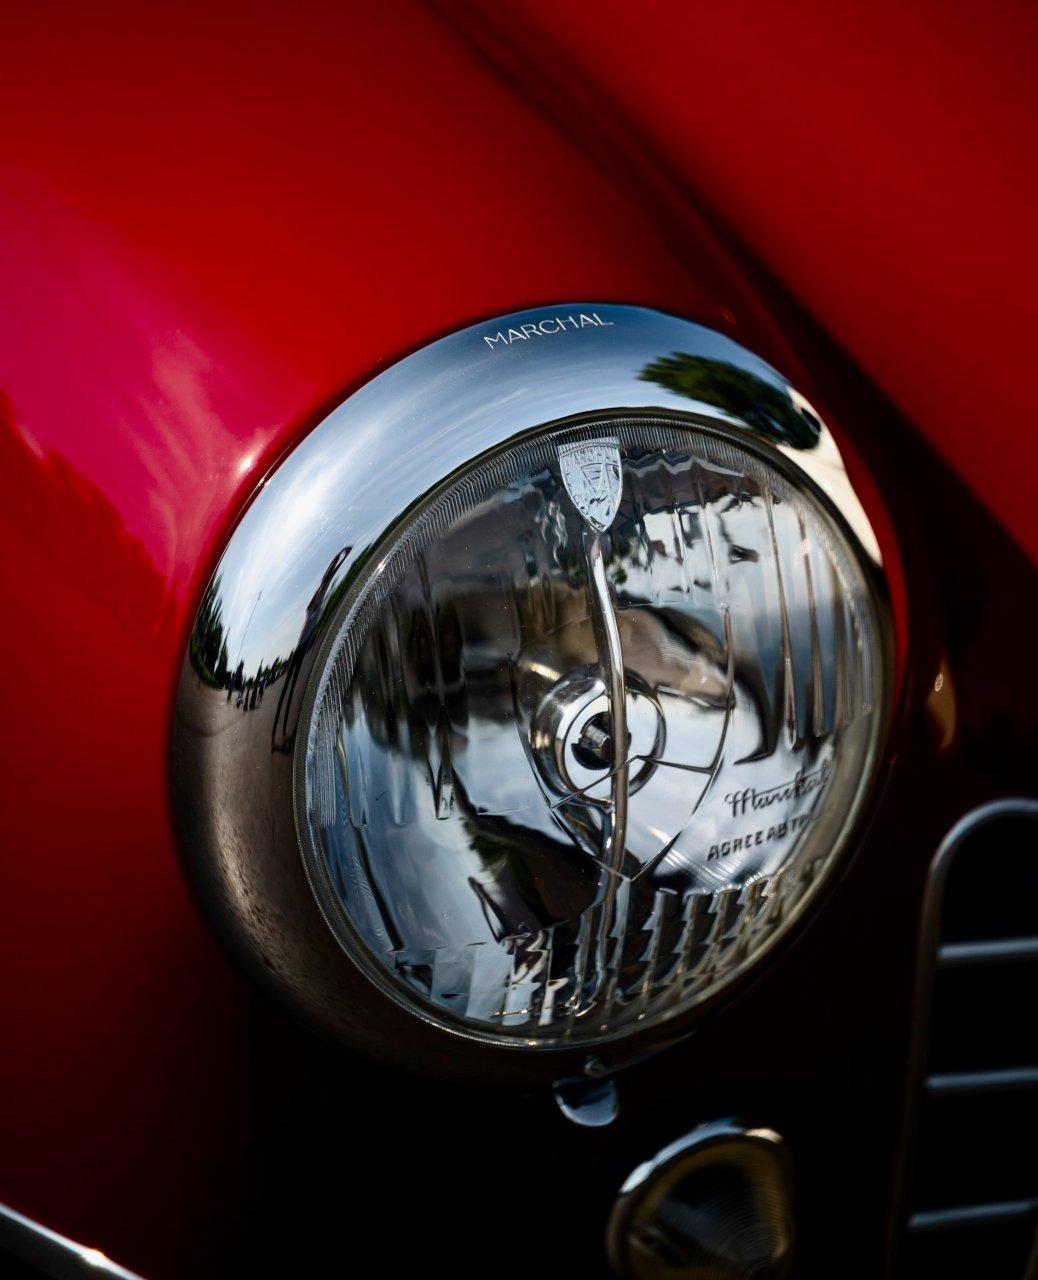 Concours of America, Hartmann-bodied 1937 Cadillac, 1953 Ferrari take best of show in Michigan, ClassicCars.com Journal